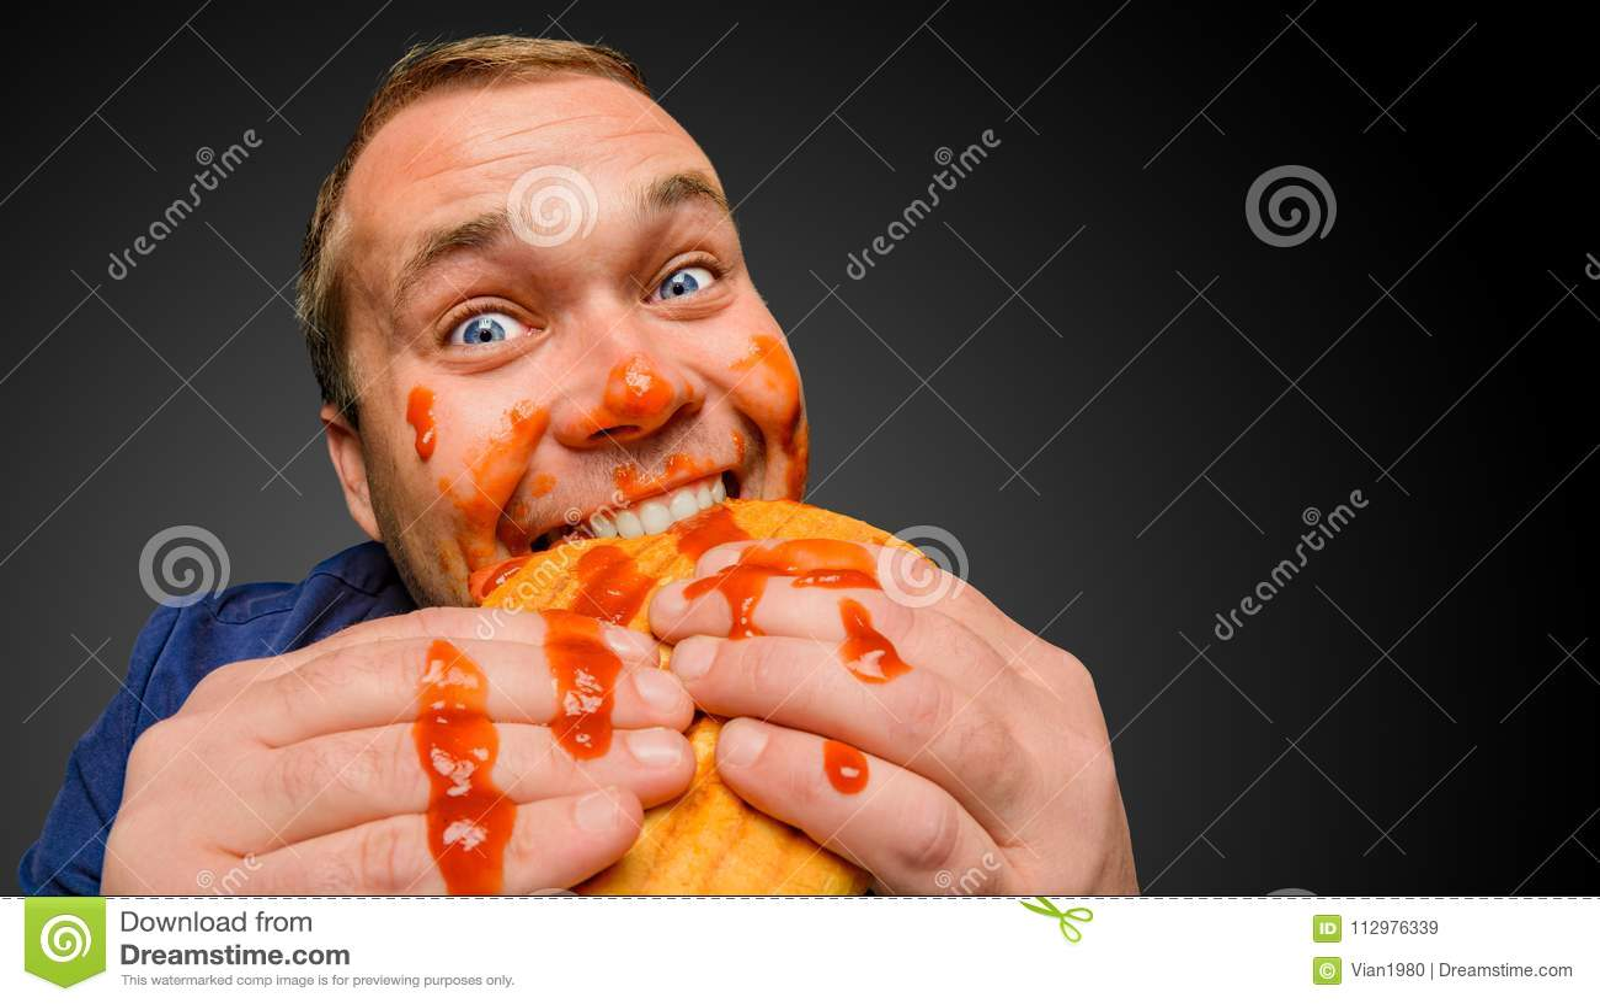 Fat man bites the tasty panini sandwich